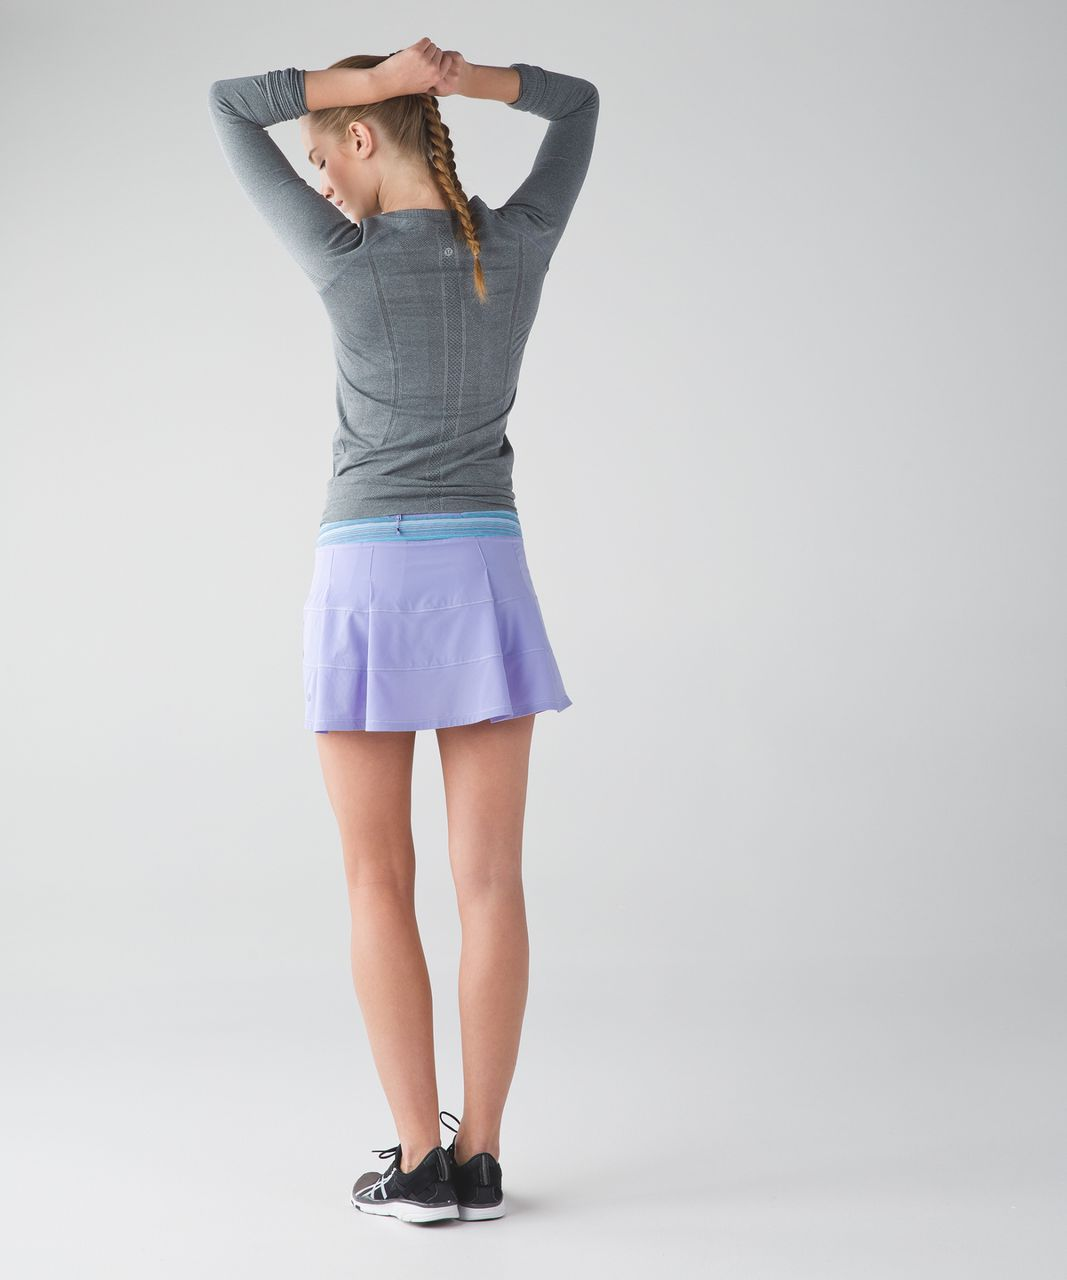 Lululemon Pace Rival Skirt II (Tall) - Lilac / Wave Twist Lilac Caspian Blue